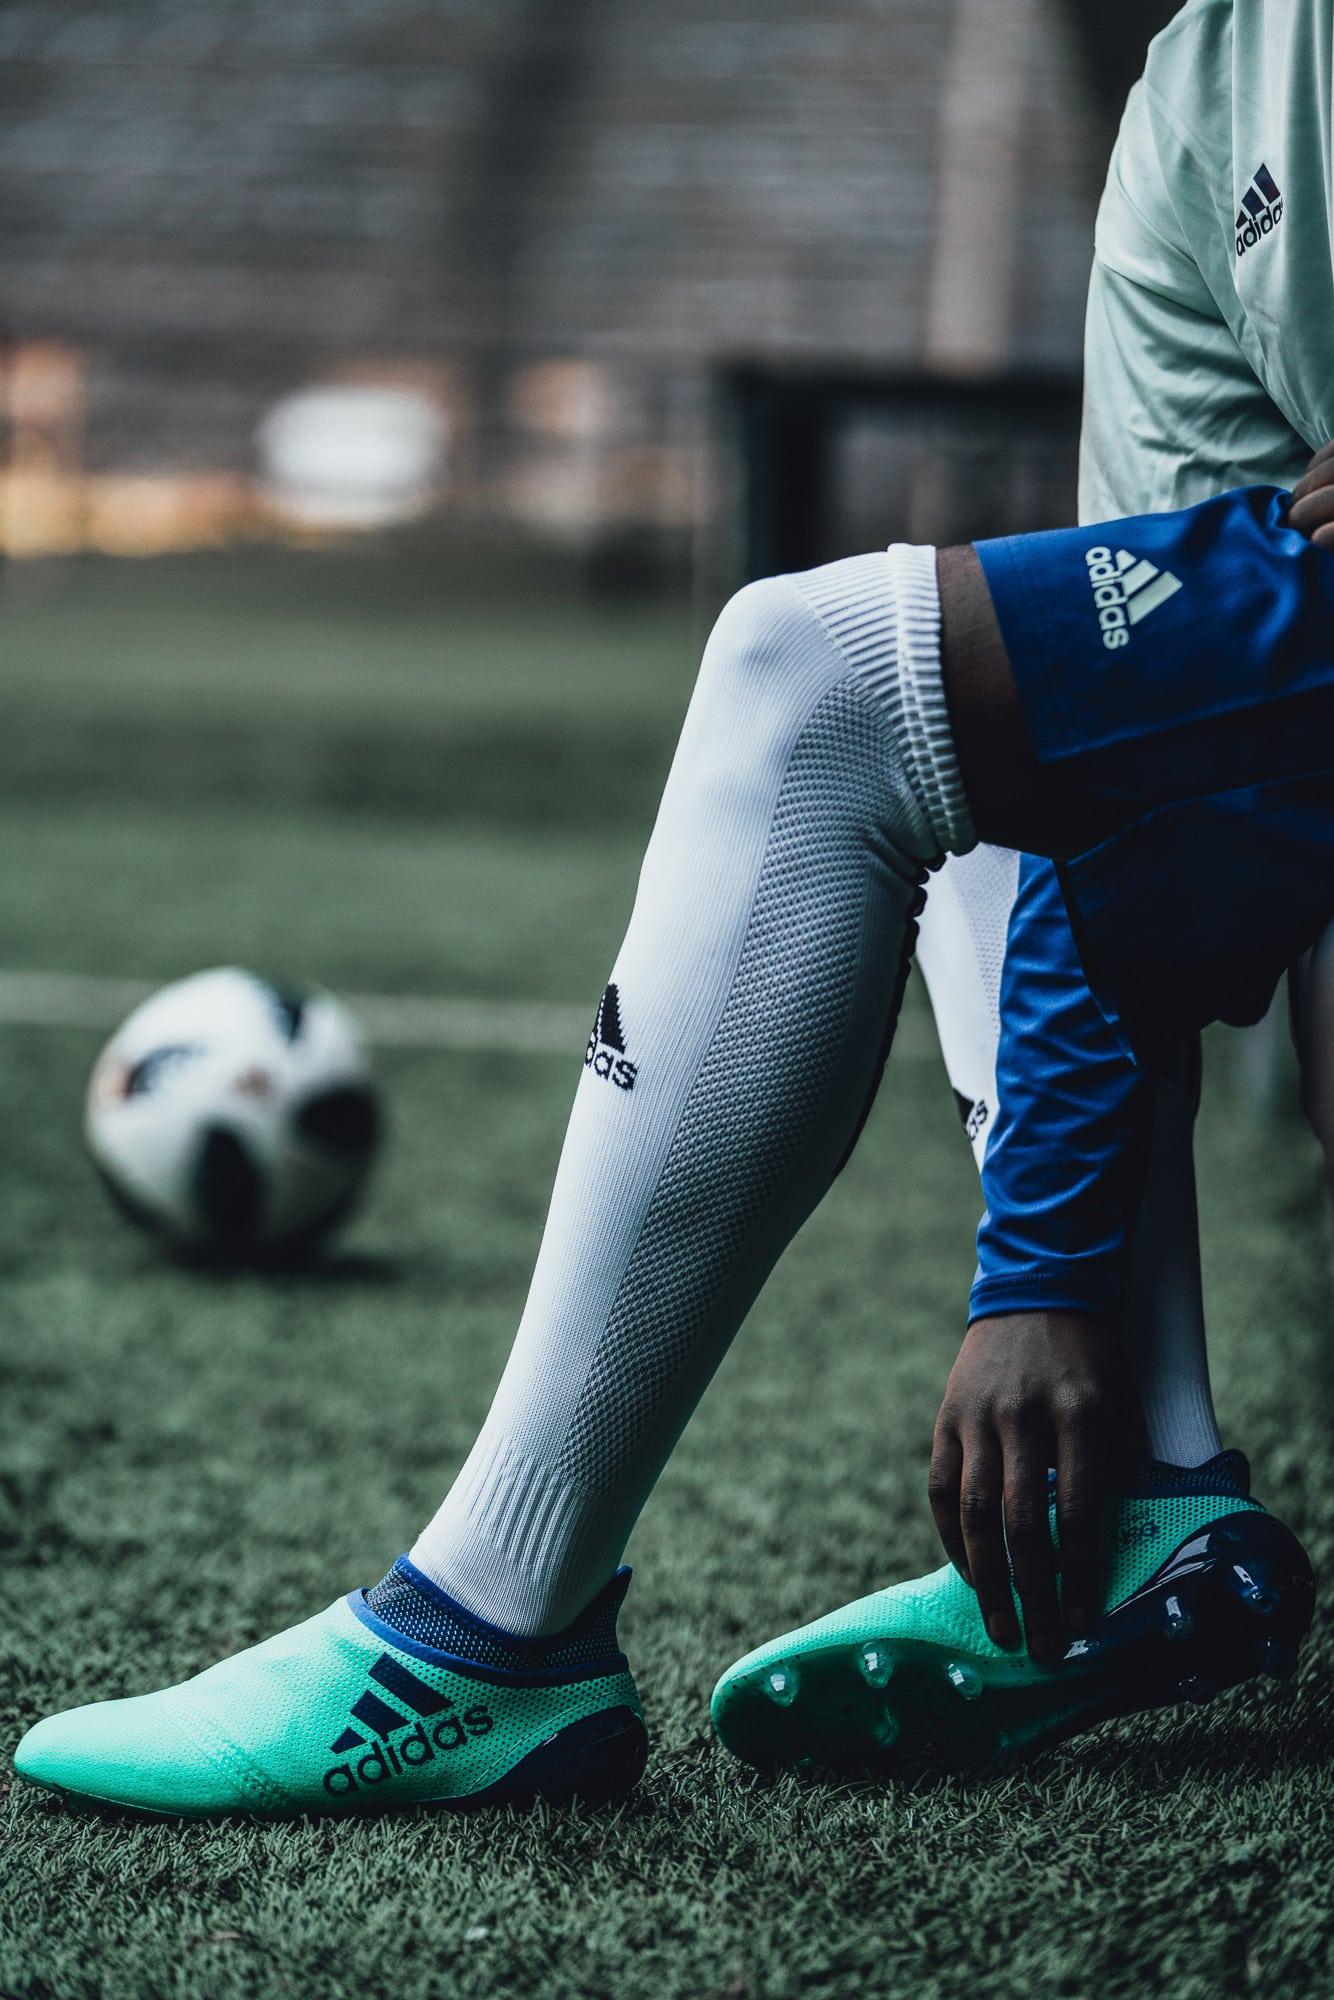 chaussure-football-adidas-x17-deadly-strike-mars-2018-3